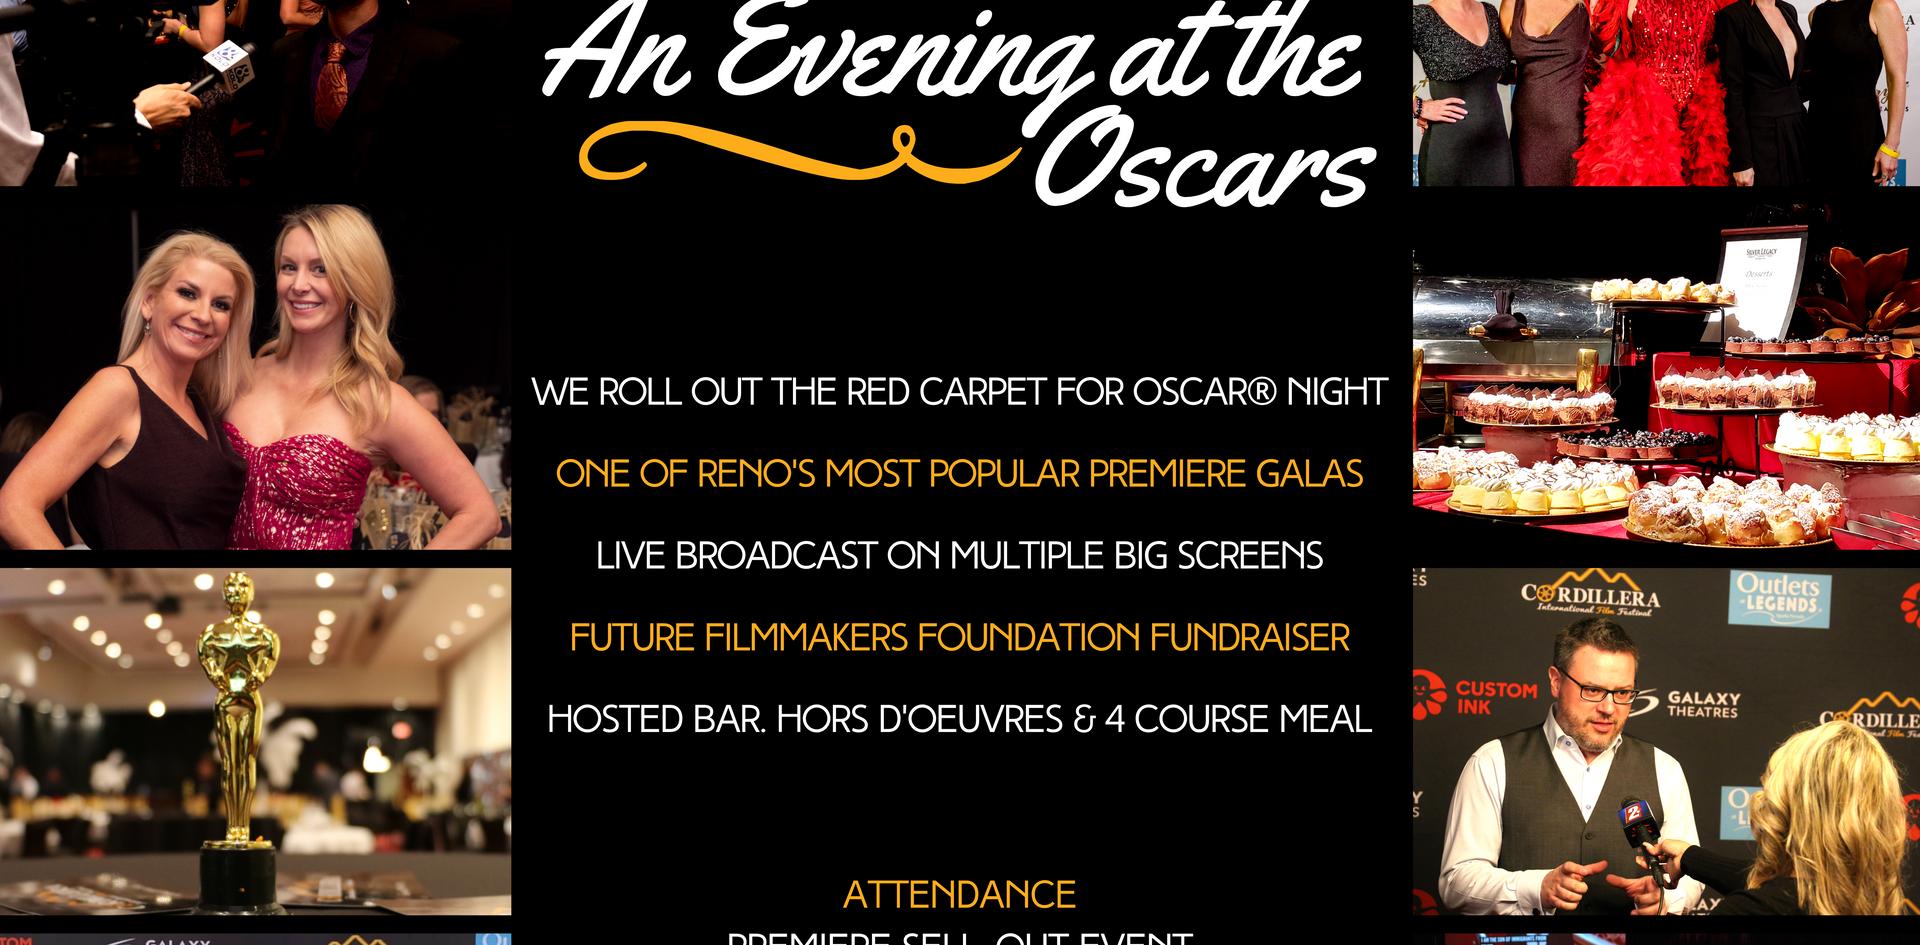 An Evening at the Oscars